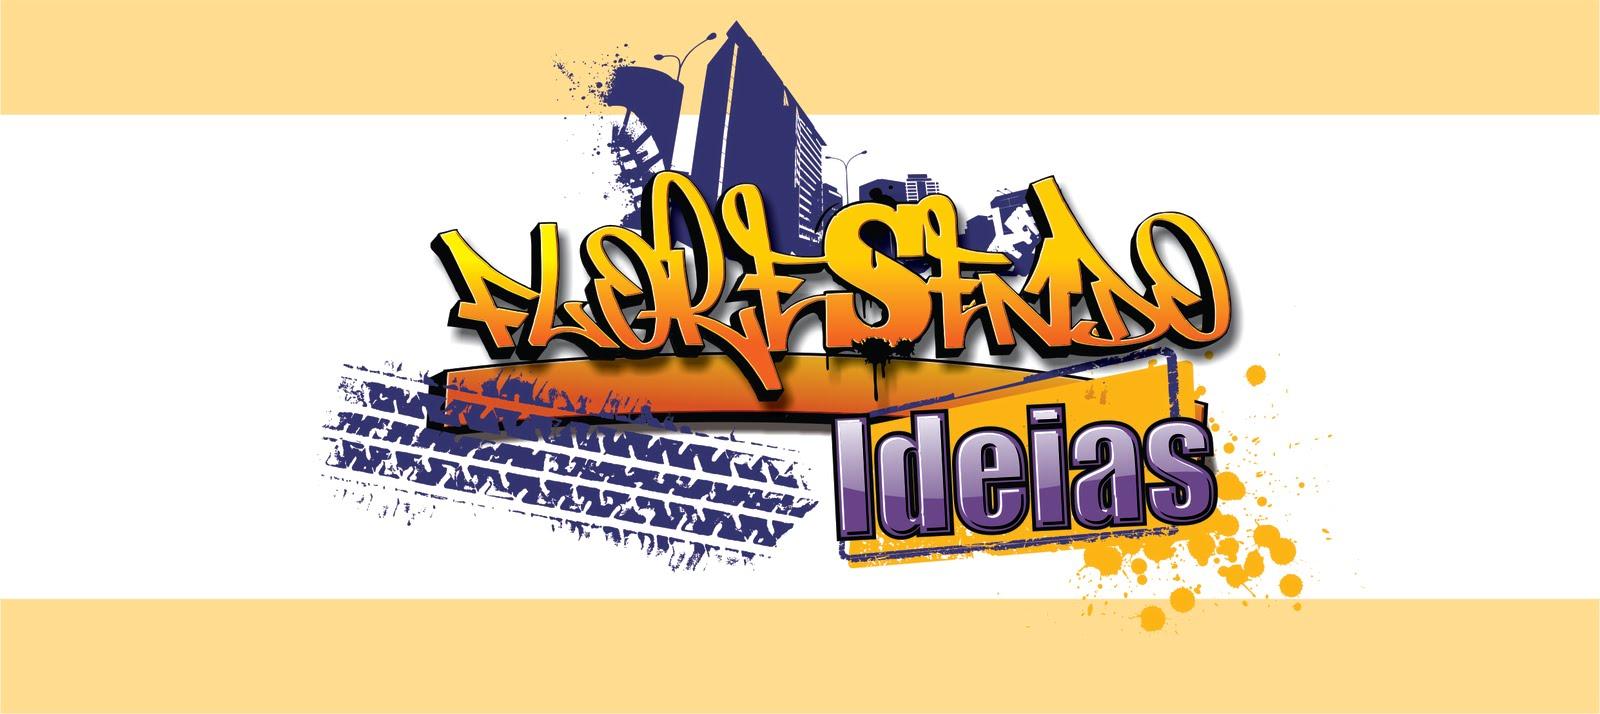 PE – FloreSendo Ideias, Juventude, Hip Hop e Outras Conversas